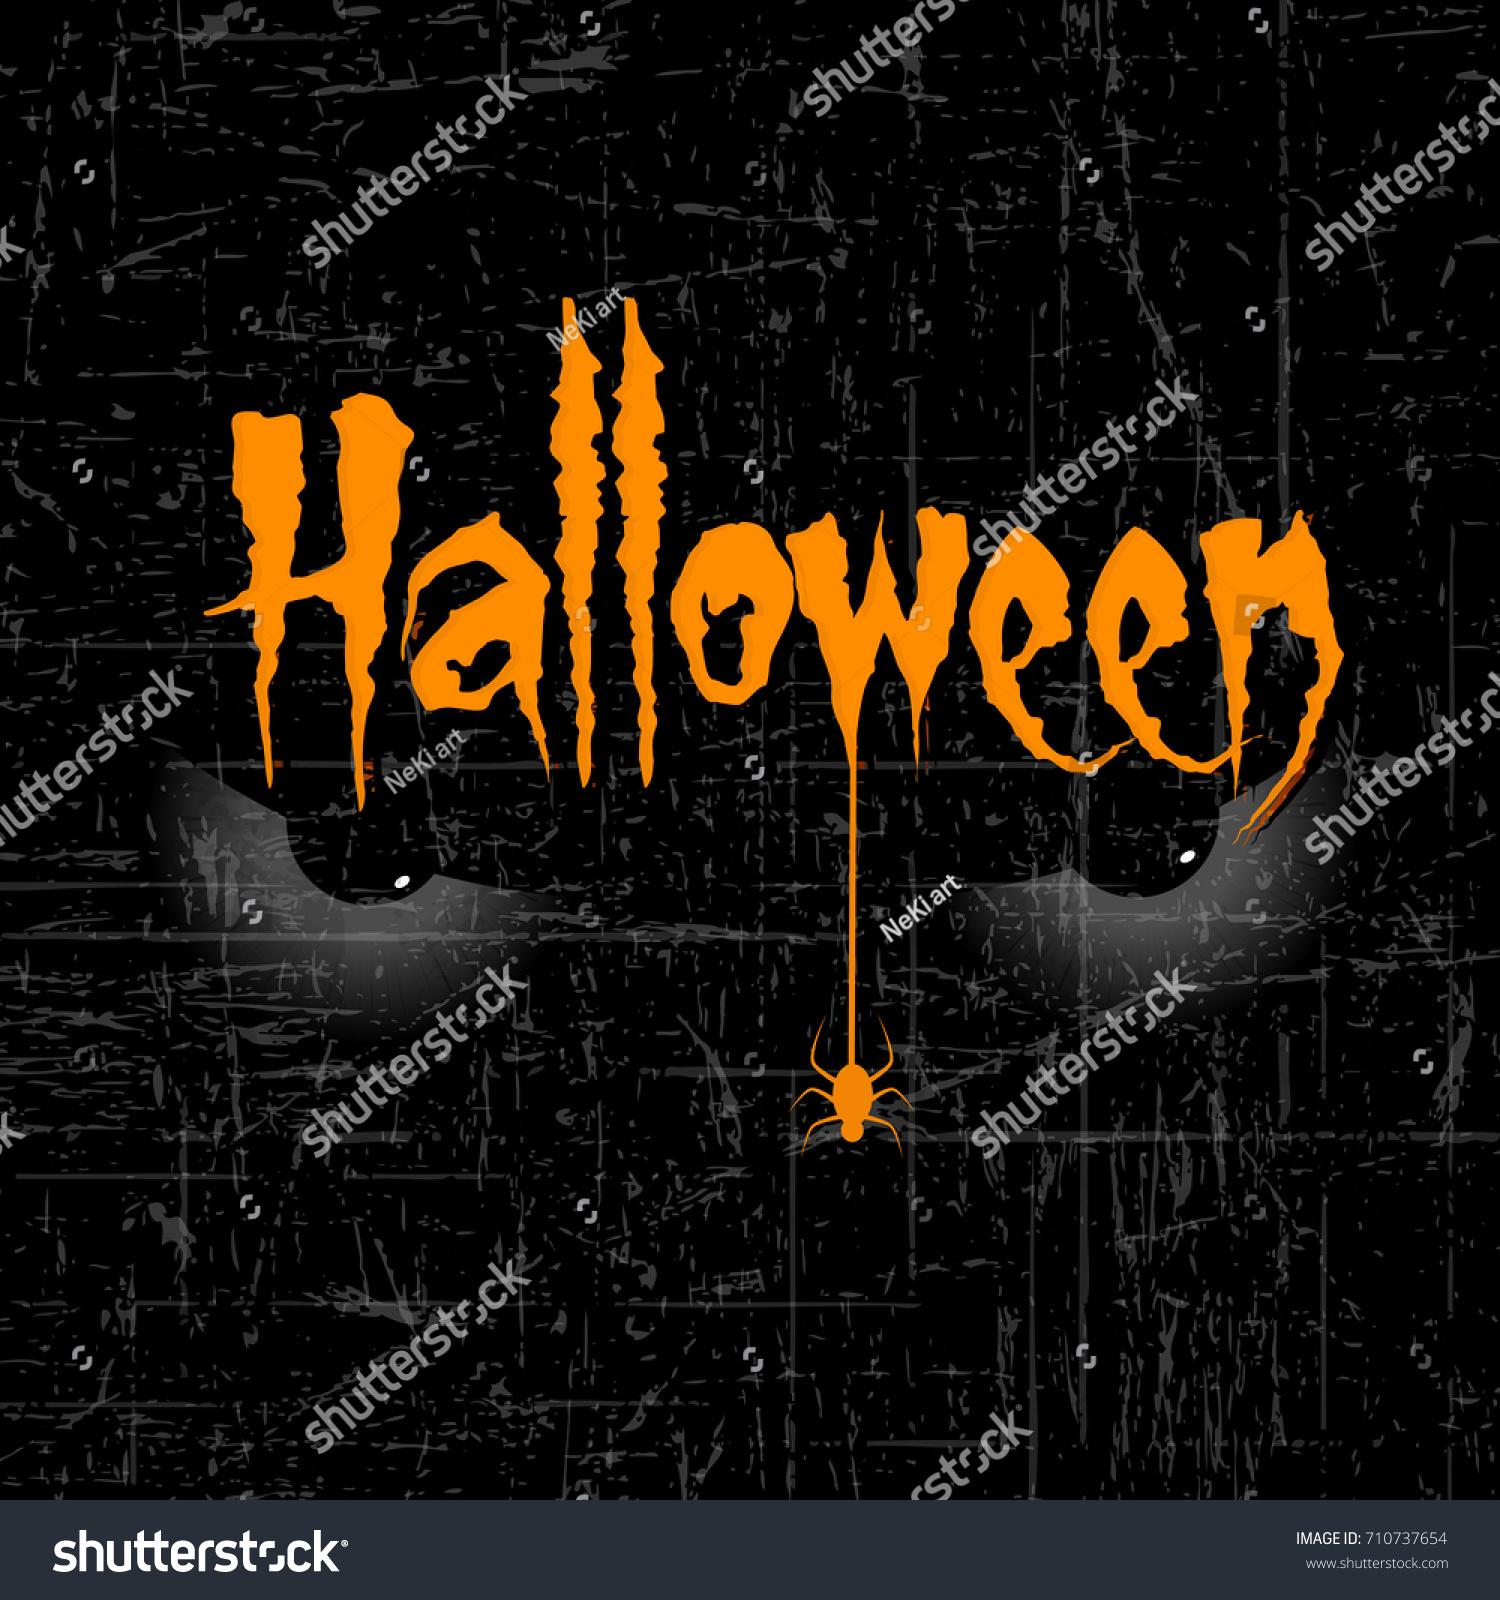 scary halloween eyes creative text halloween stock vector (royalty